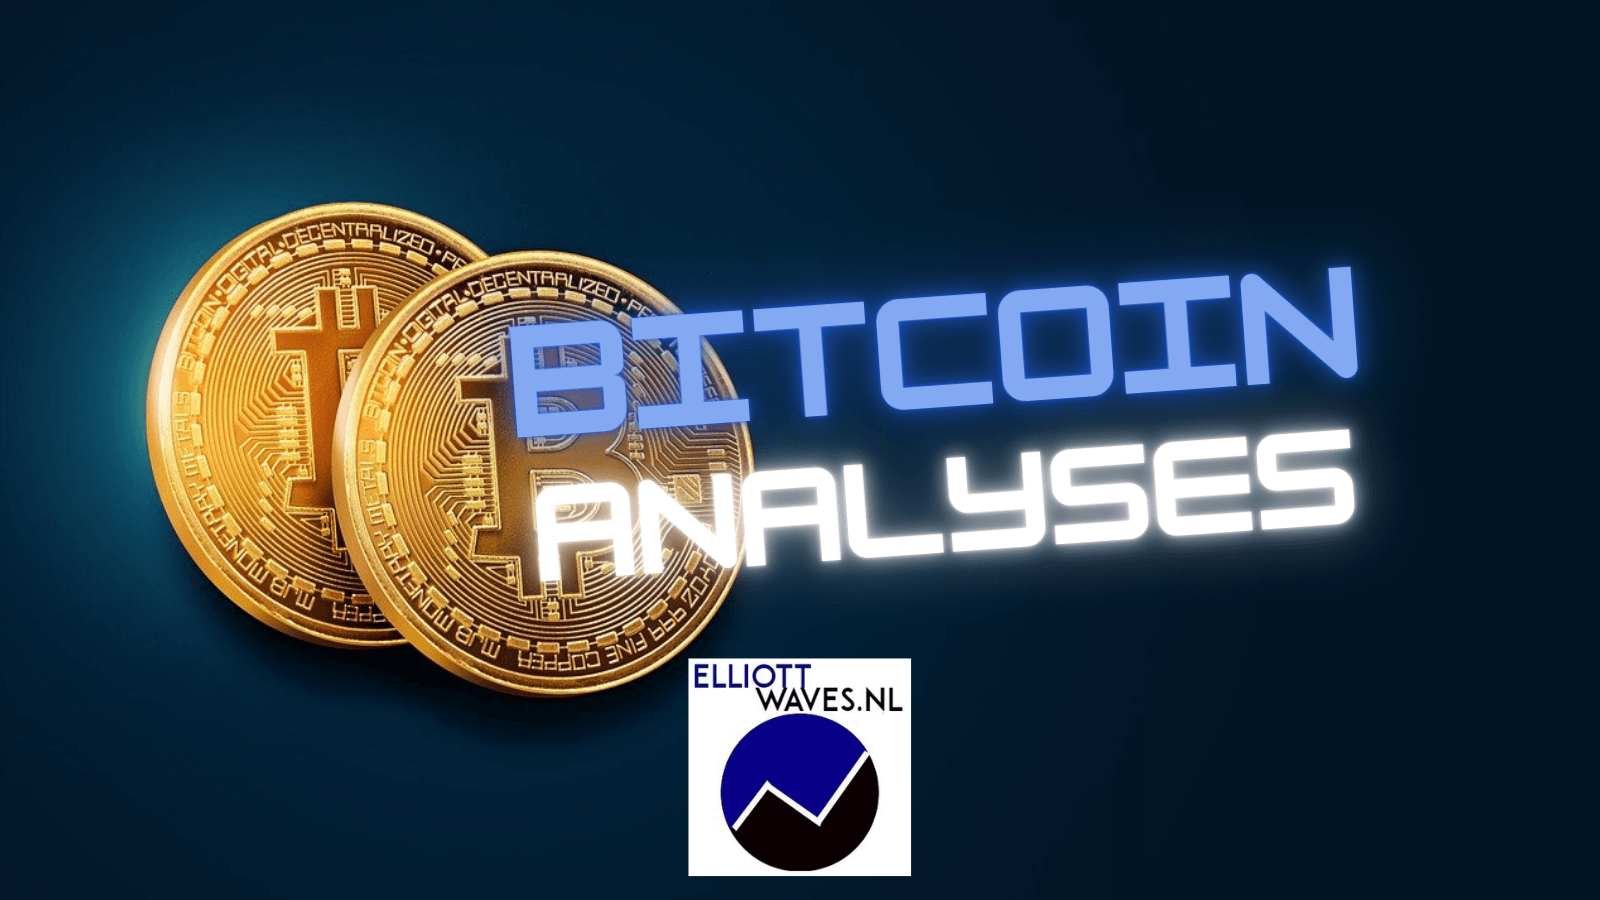 elliottwaves.nl bitcoin analyses